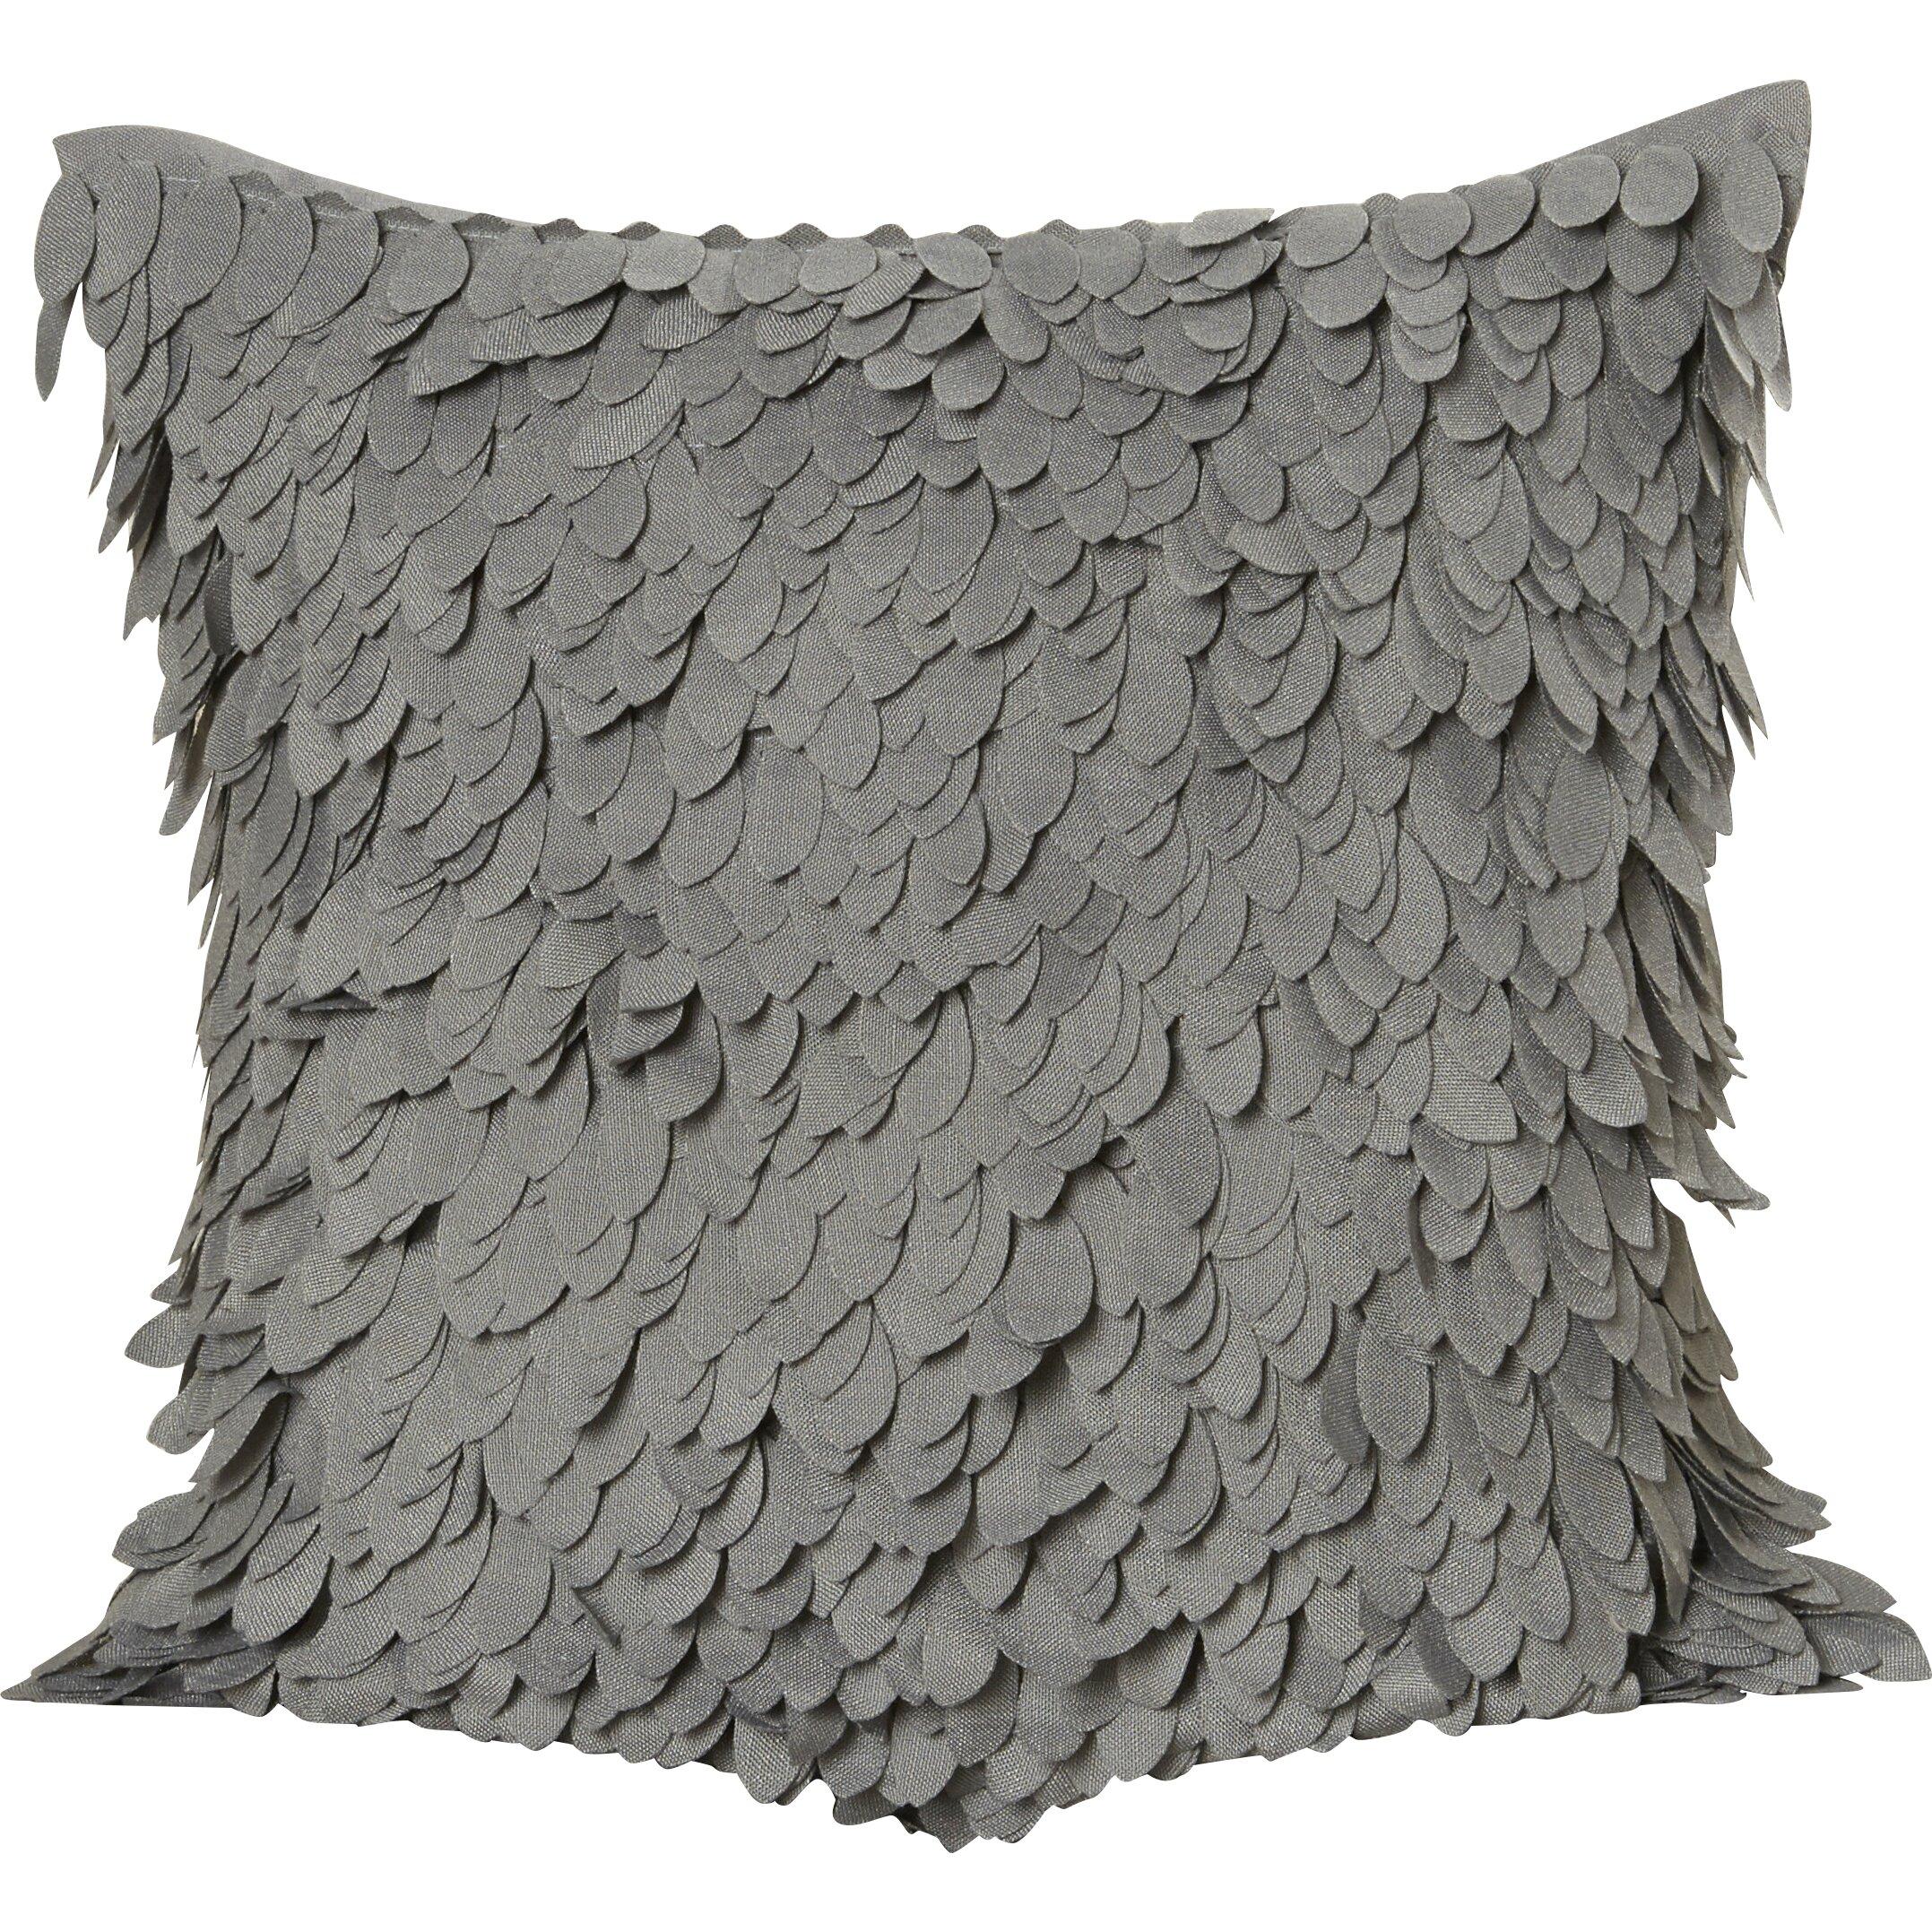 Throw Pillows Ruffle : House of Hampton Luanna Ruffle Throw Pillow & Reviews Wayfair